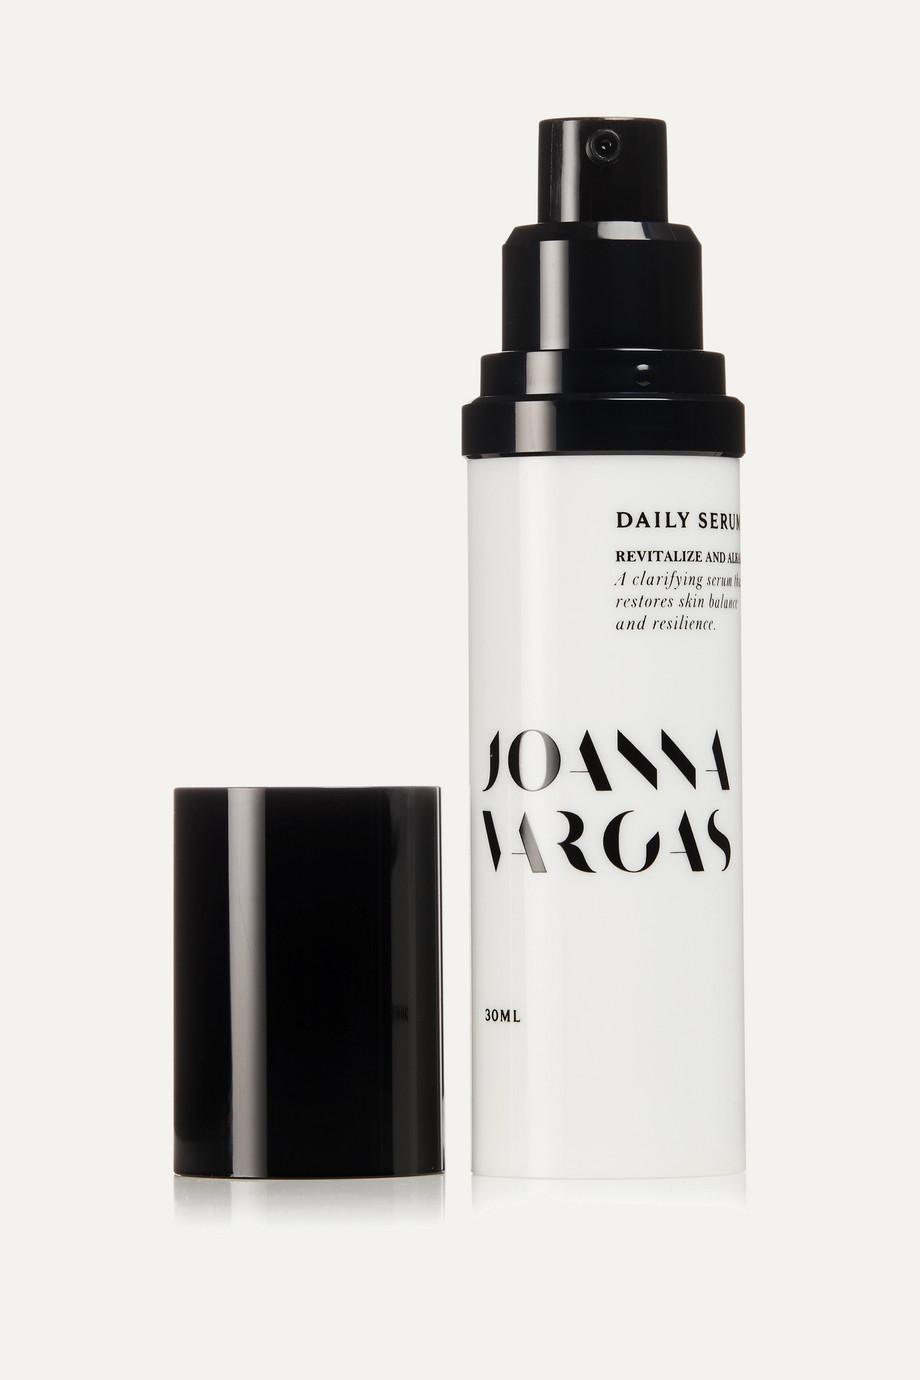 Joanna Vargas Daily Serum – 30 ml – Serum